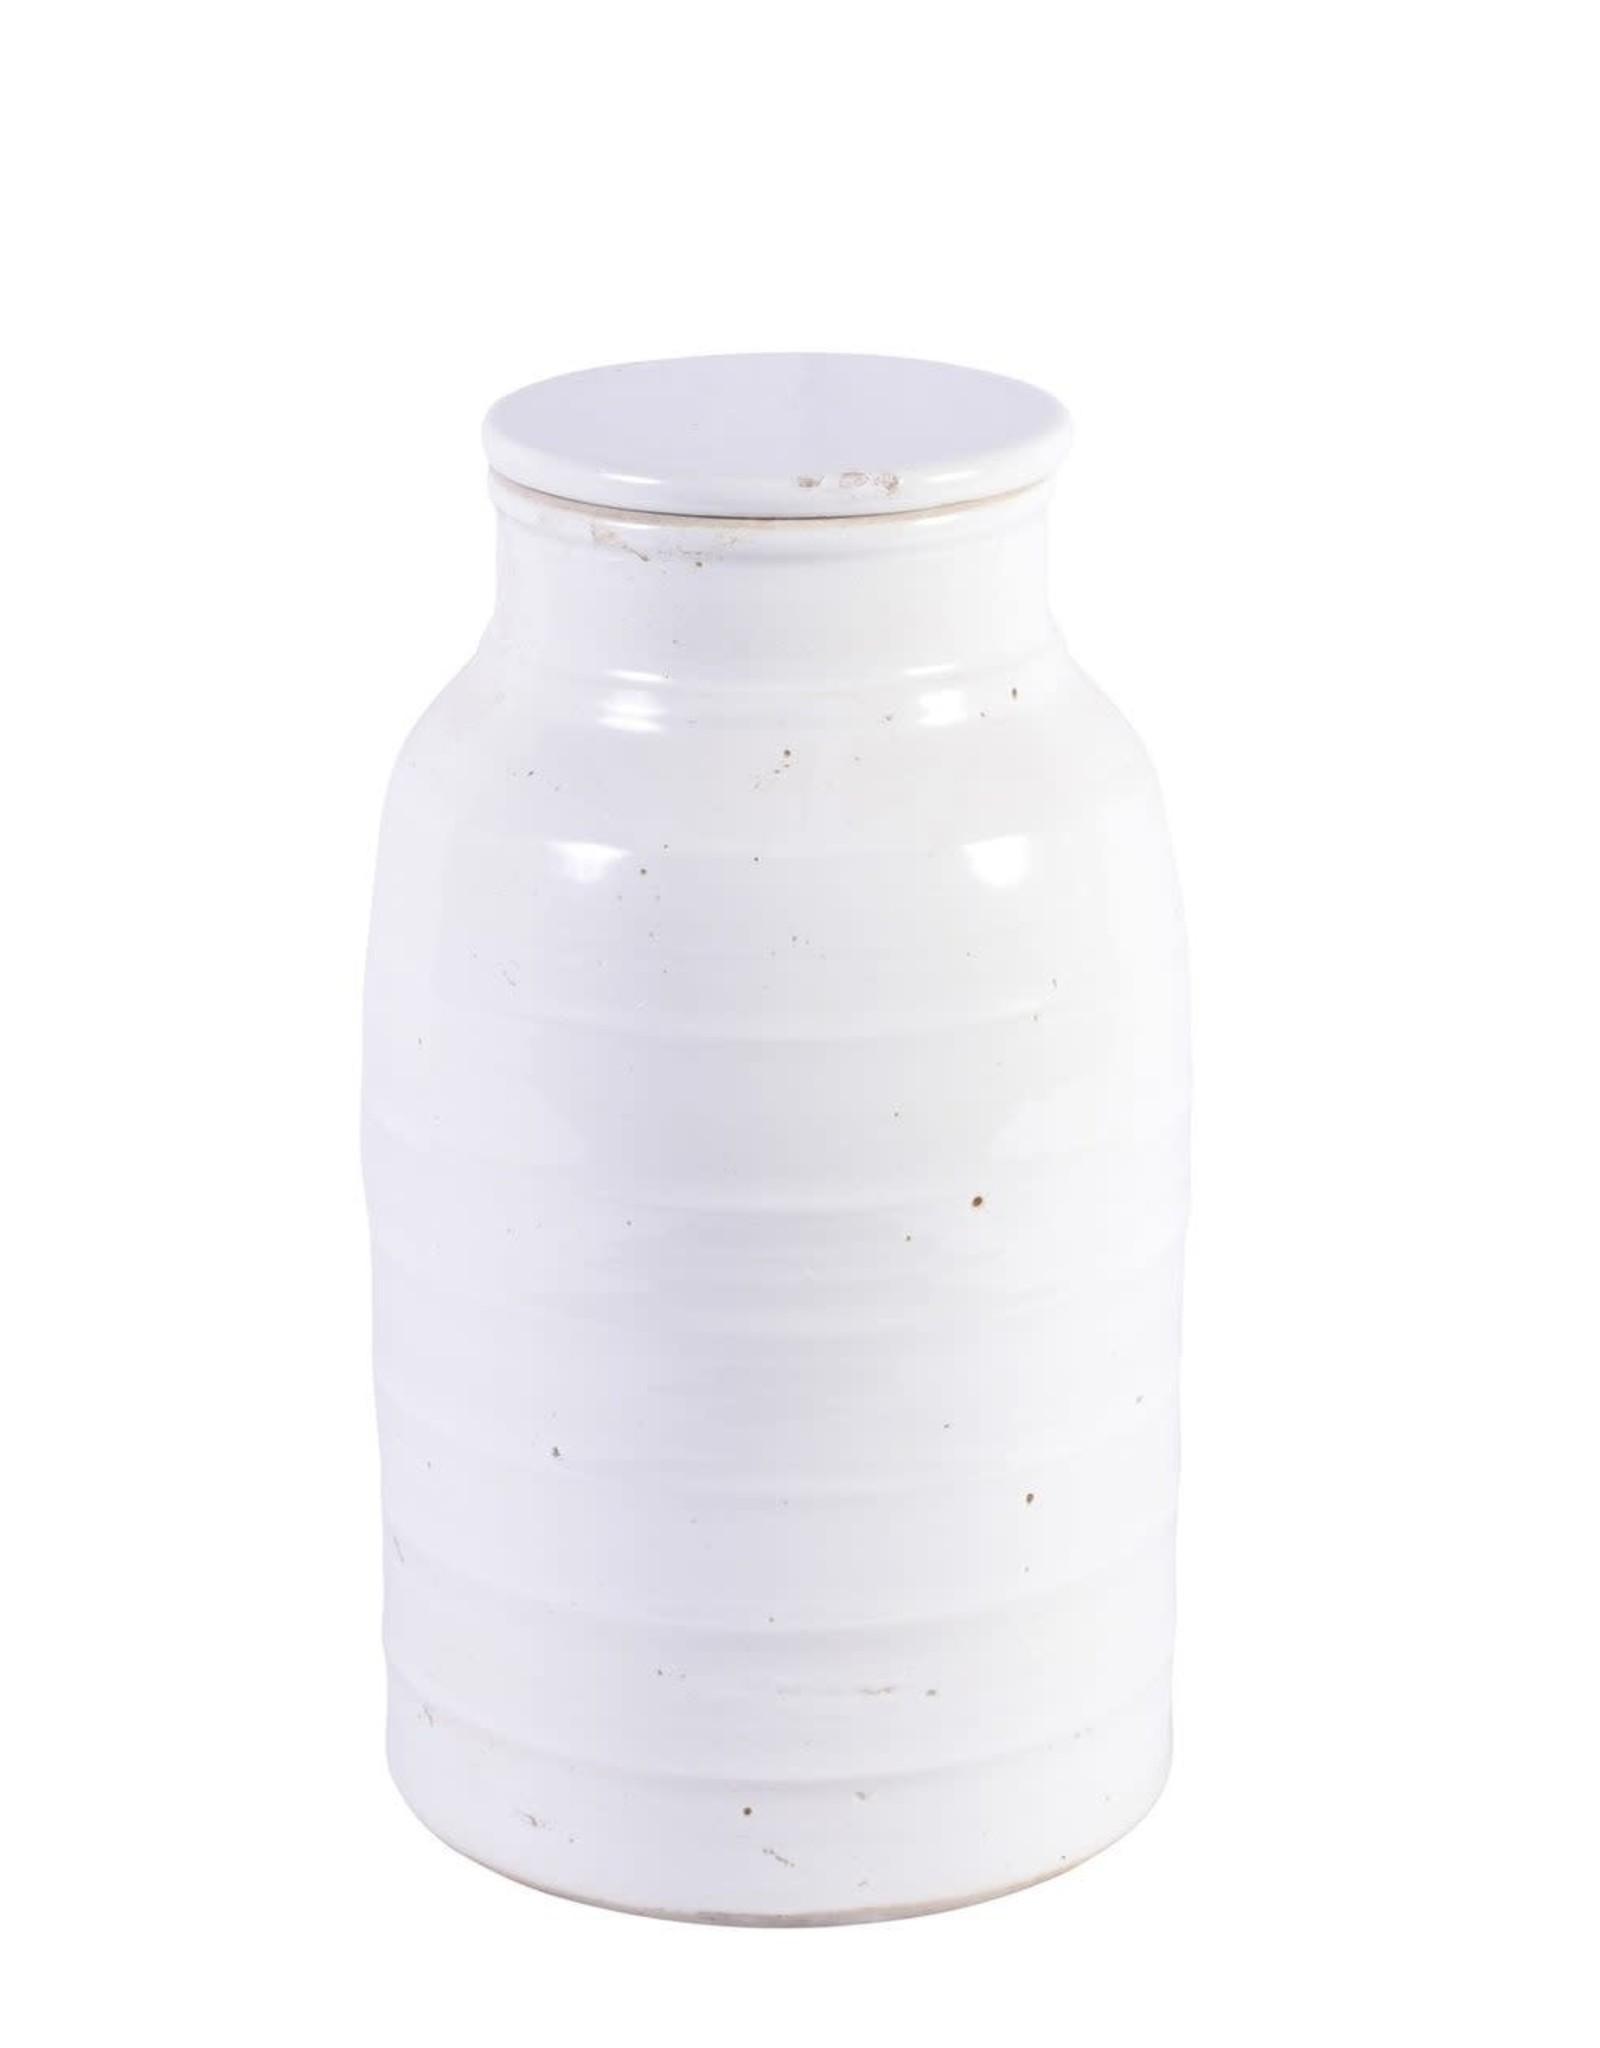 Busan White Flat Lidded Jar ShortW: 8.5 D: 8.5 H: 16